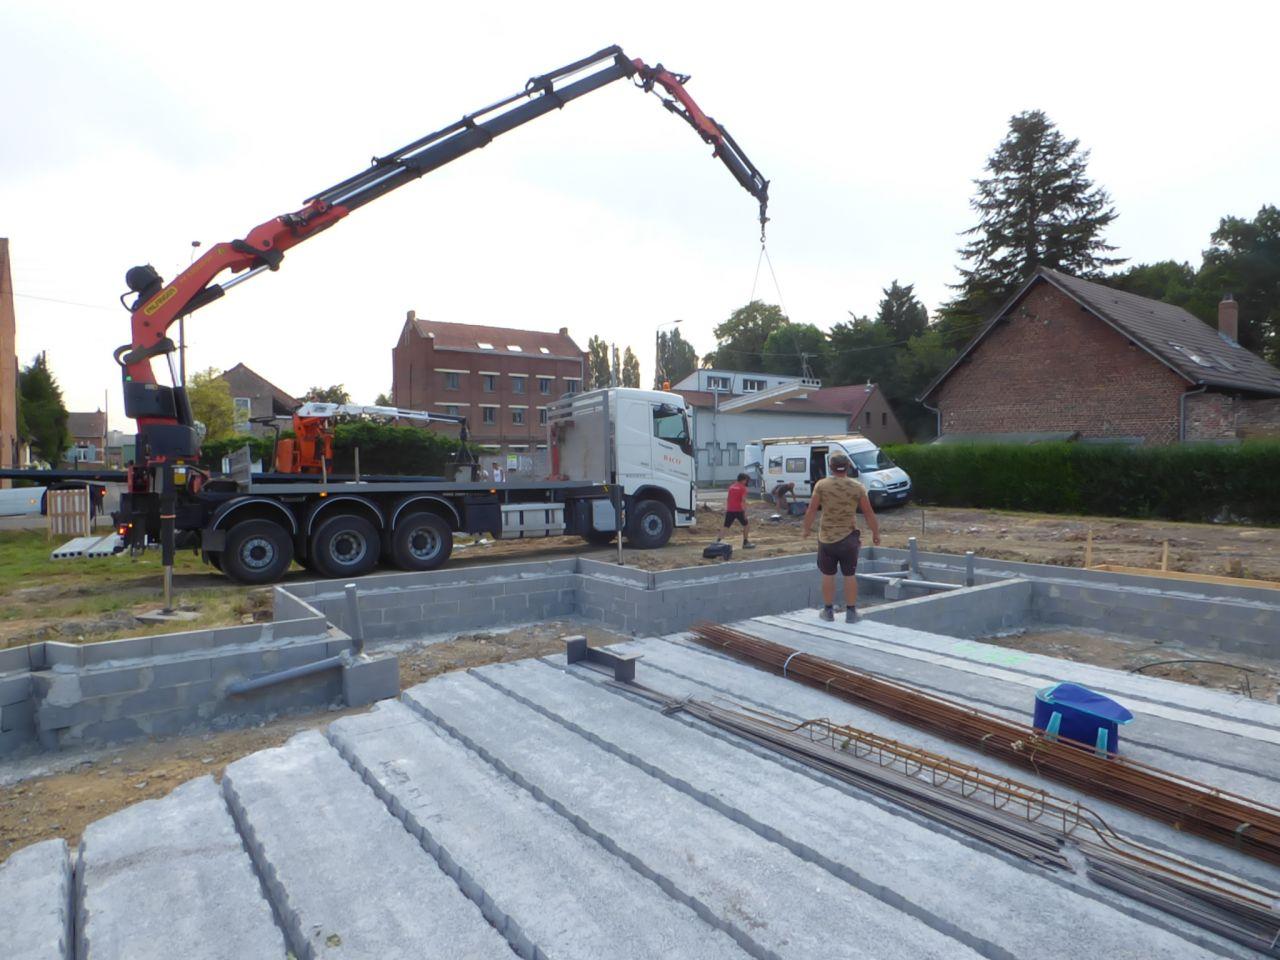 Livraison et installation du  plancher veodal